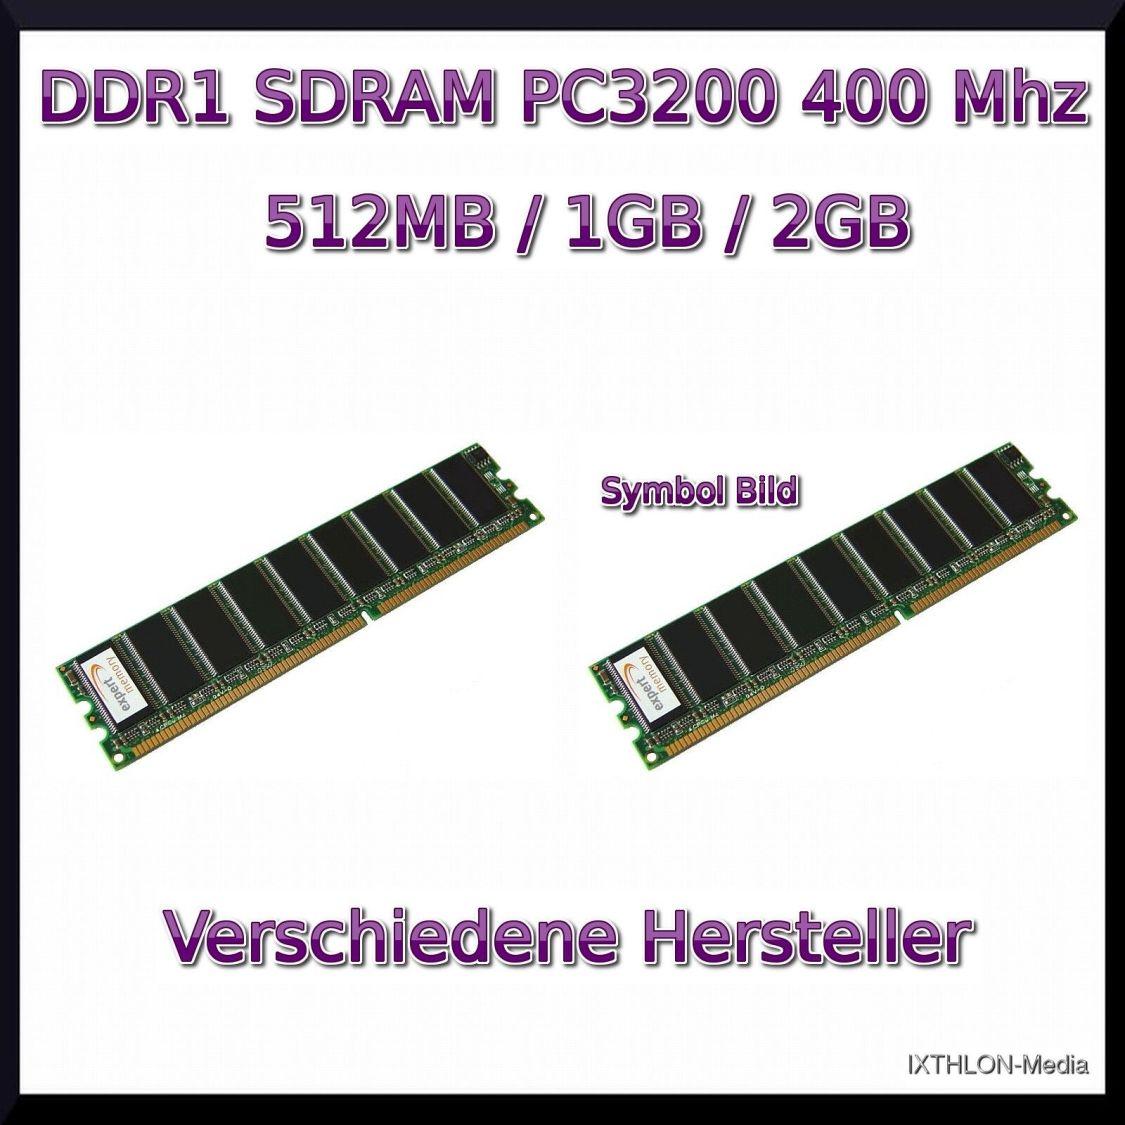 4GB / 2GB / 1GB / 512MB - DDR1 - PC3200 - 400Mhz - ARBEITSSPEICHER - RAM